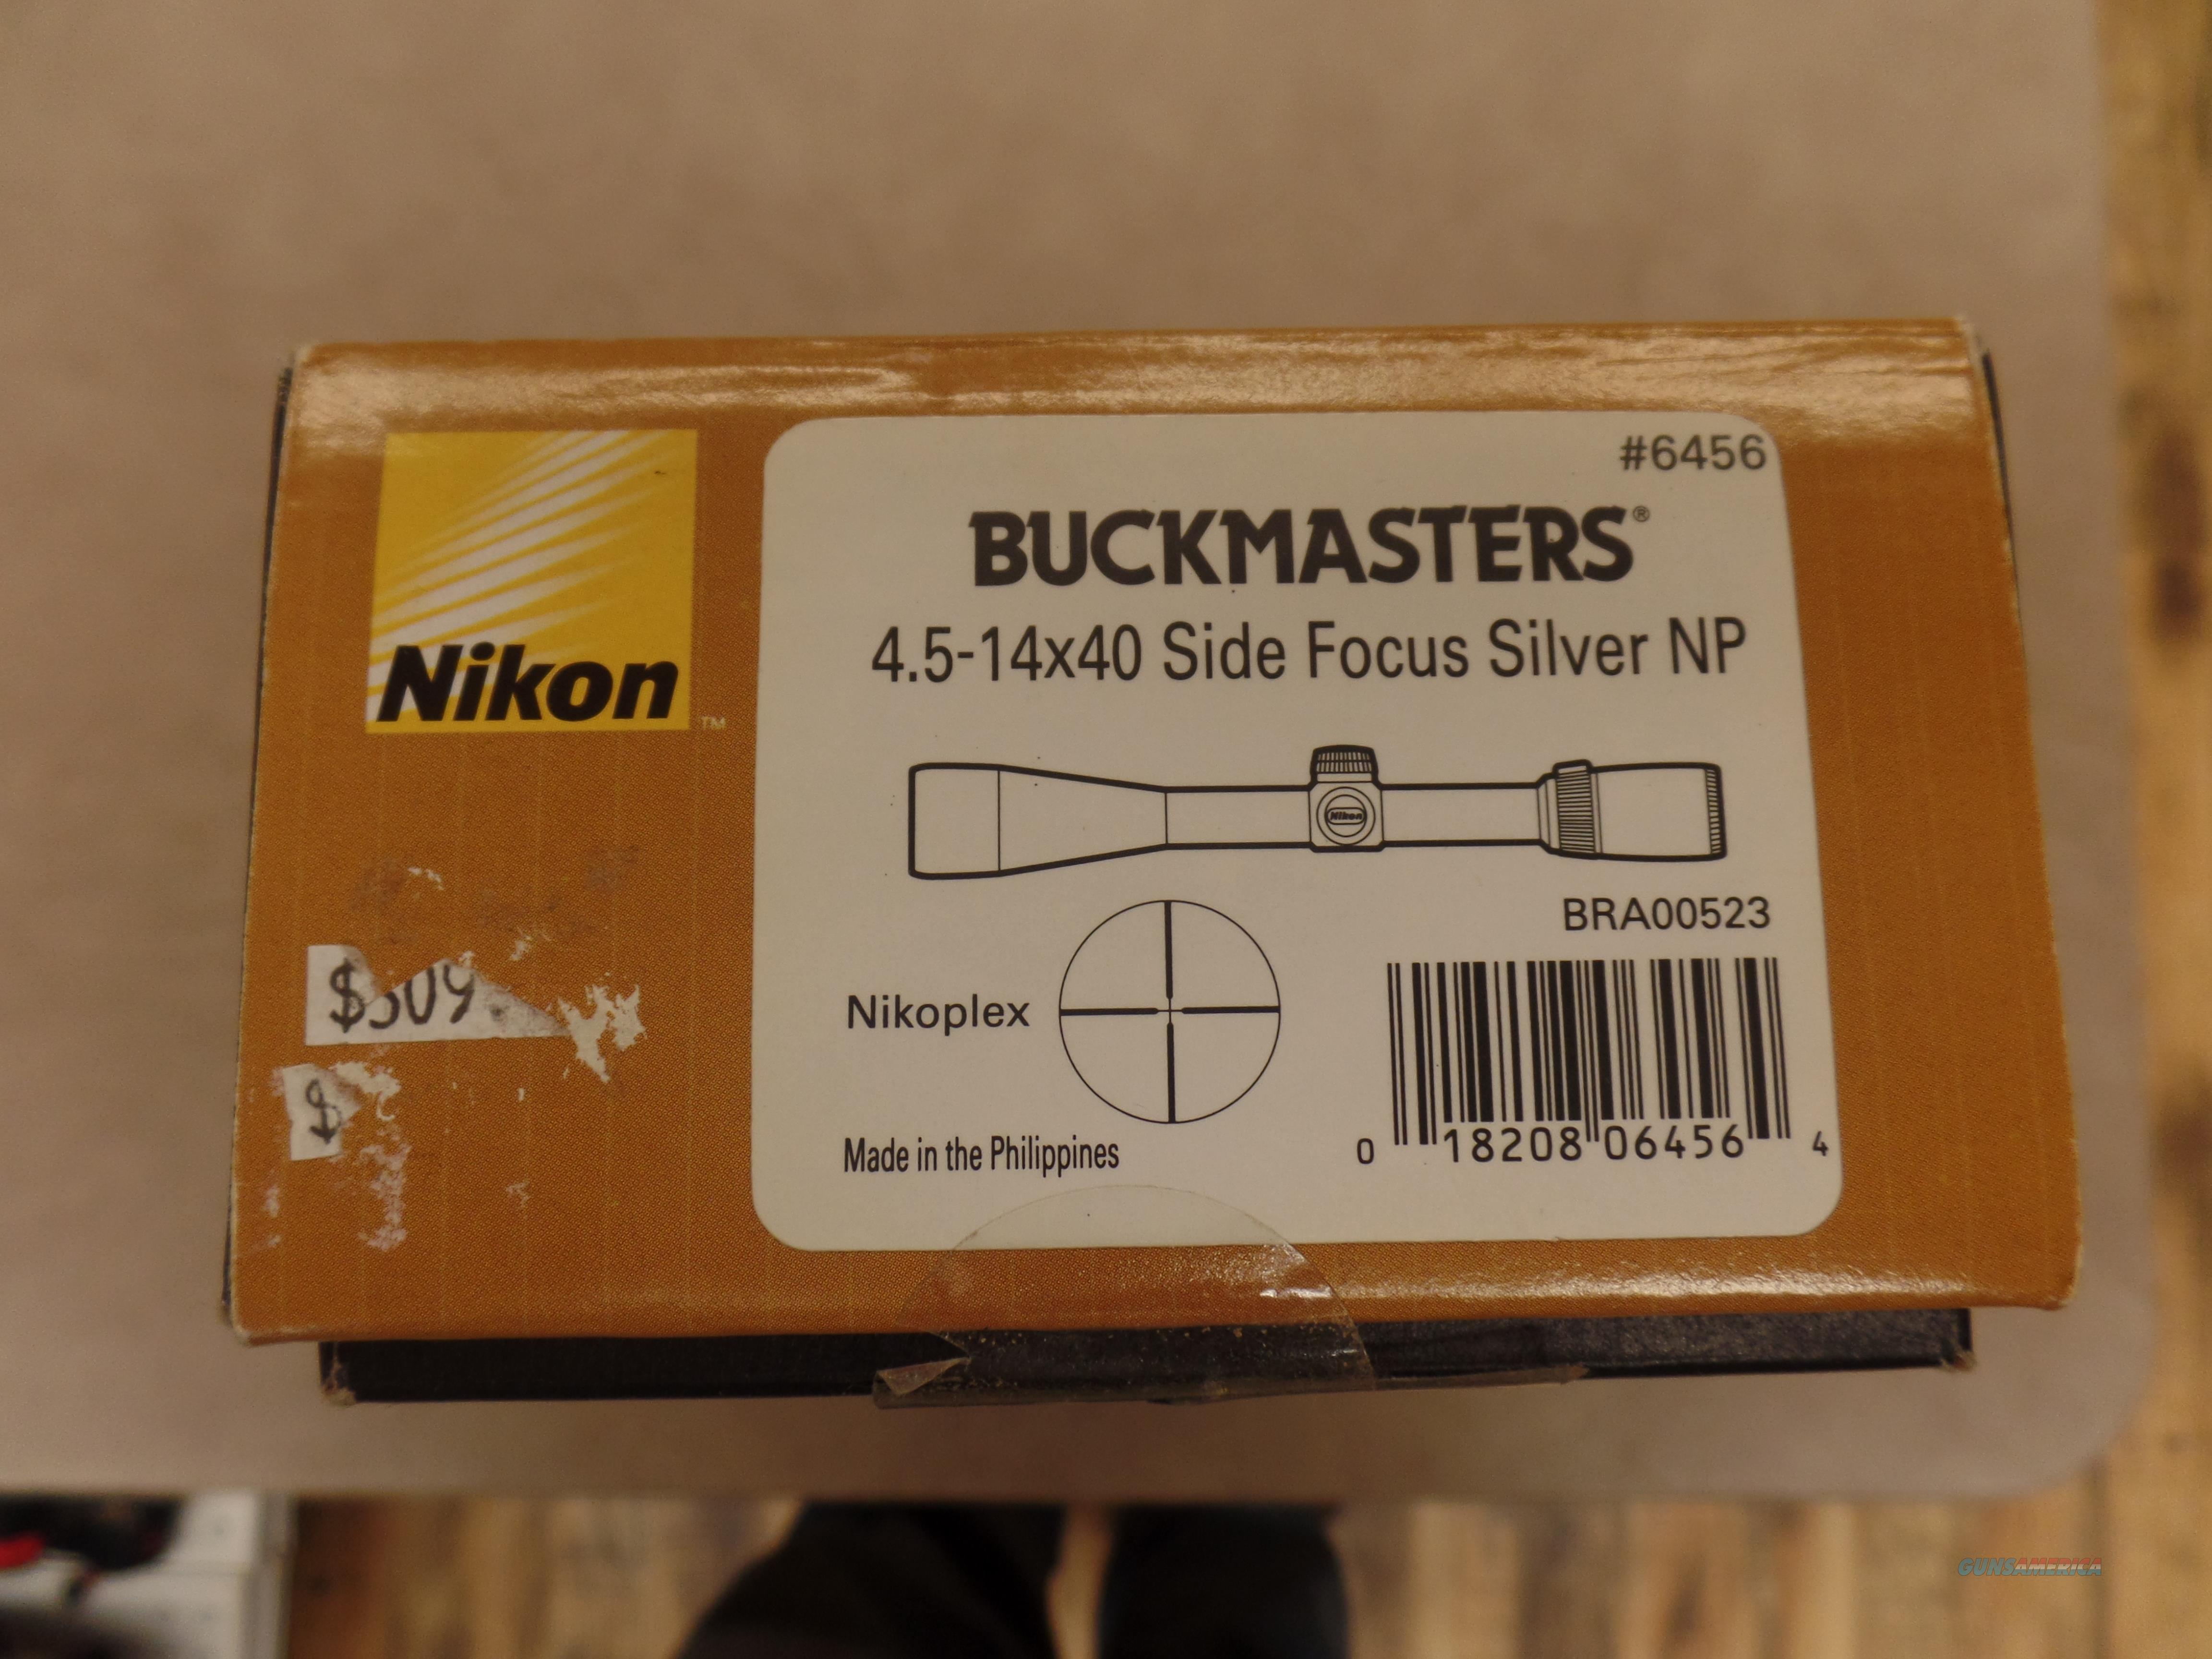 Nikon BUCKMASTER 4.5-14X40 Side Focus Silver NP  Non-Guns > Scopes/Mounts/Rings & Optics > Rifle Scopes > Variable Focal Length